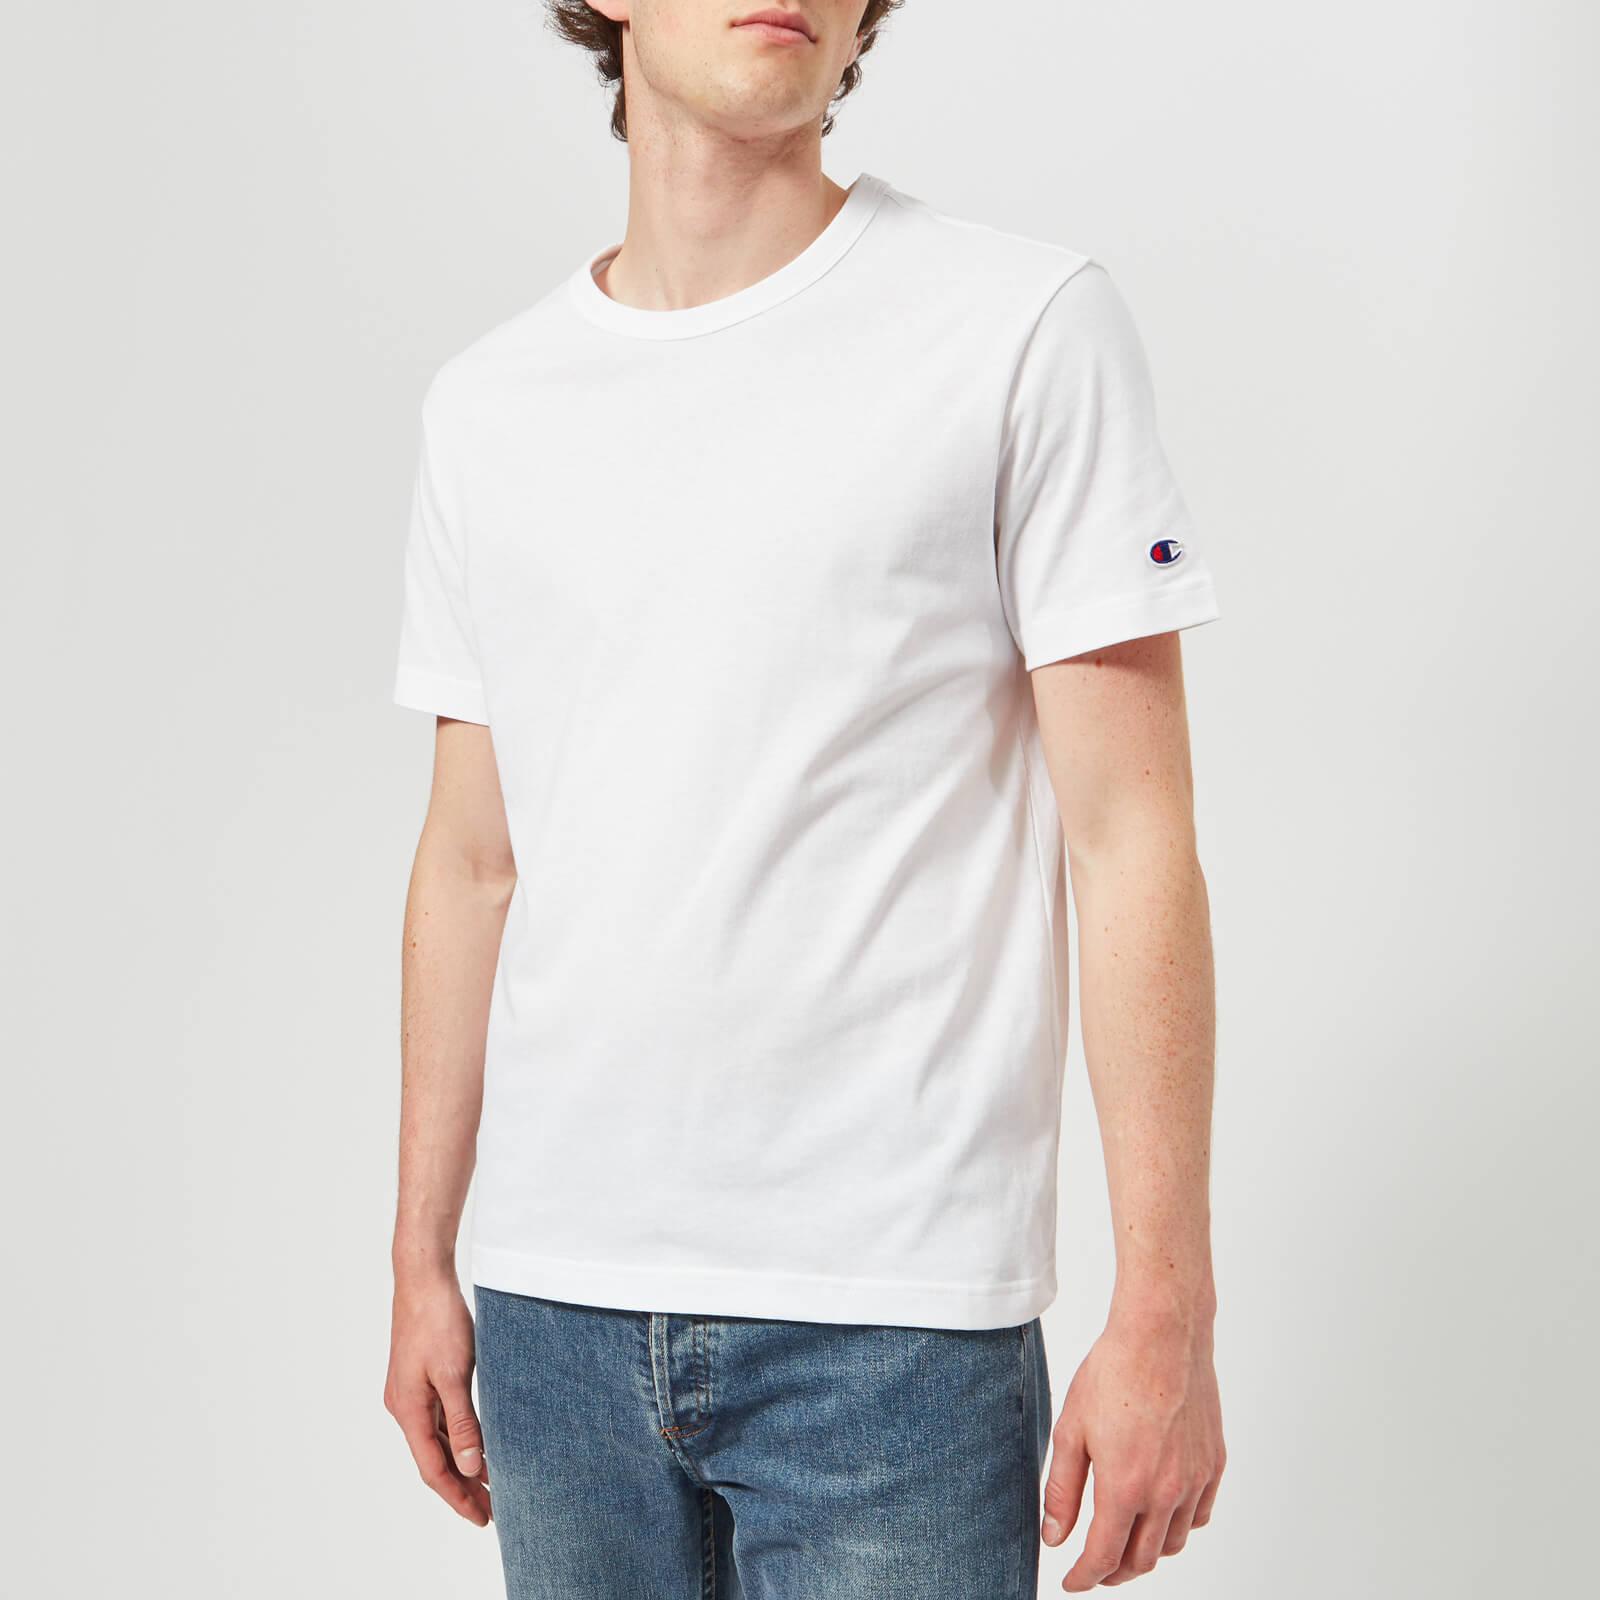 e8a0daa84e72 Champion Men's Crew Neck T-Shirt - White Clothing | TheHut.com